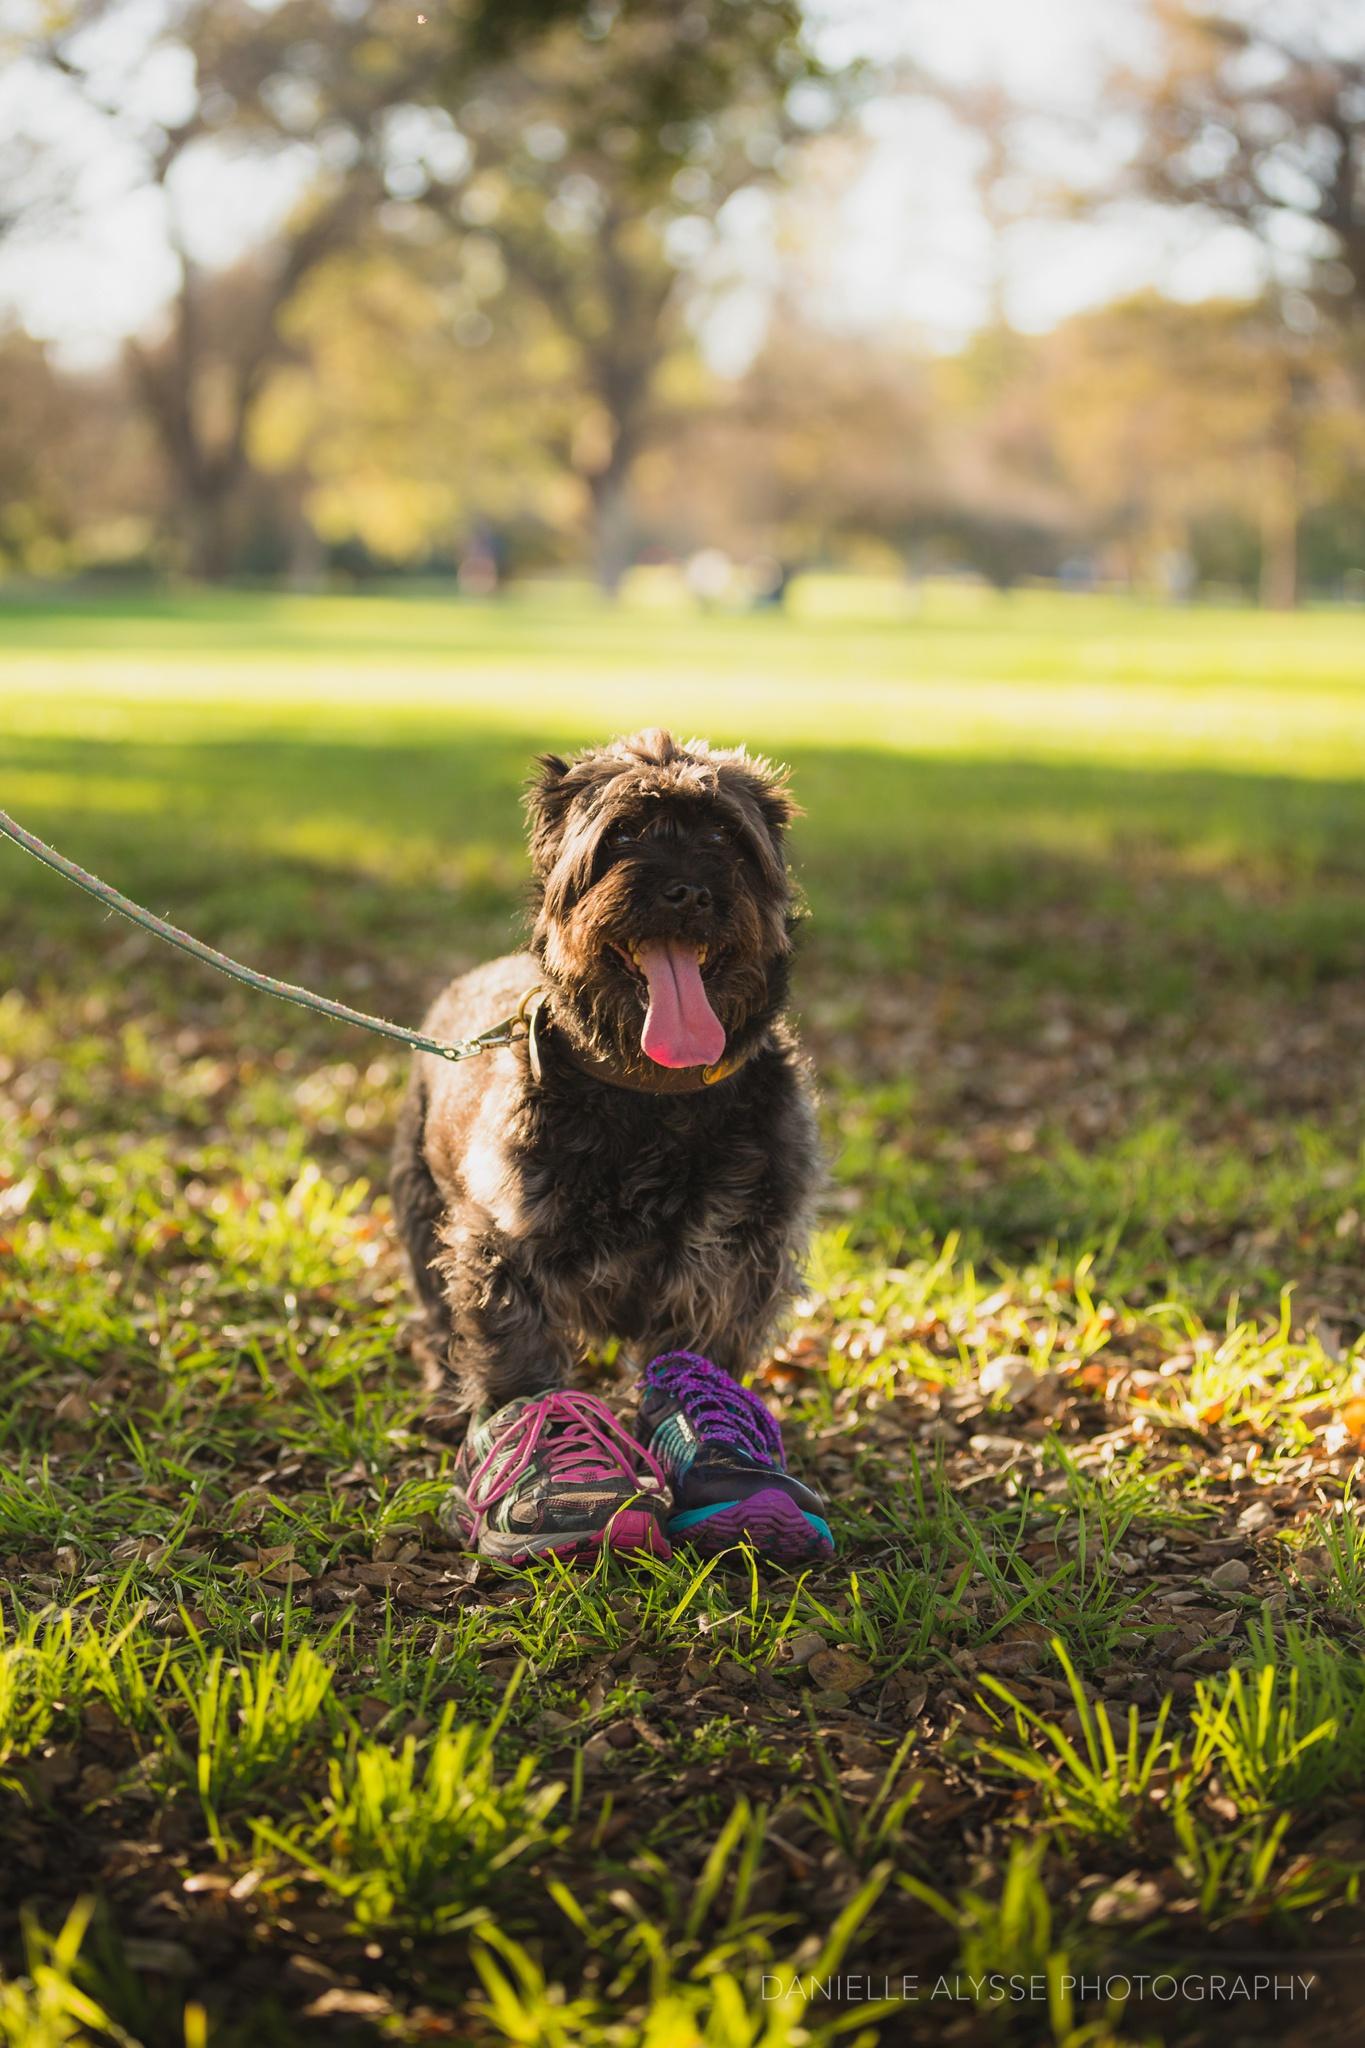 180205_sspca_spca_willam_land_park_doggy_dash_california_danielle_alysse_photography_sacramento_pet_dog_photographer_11_WEB.jpg